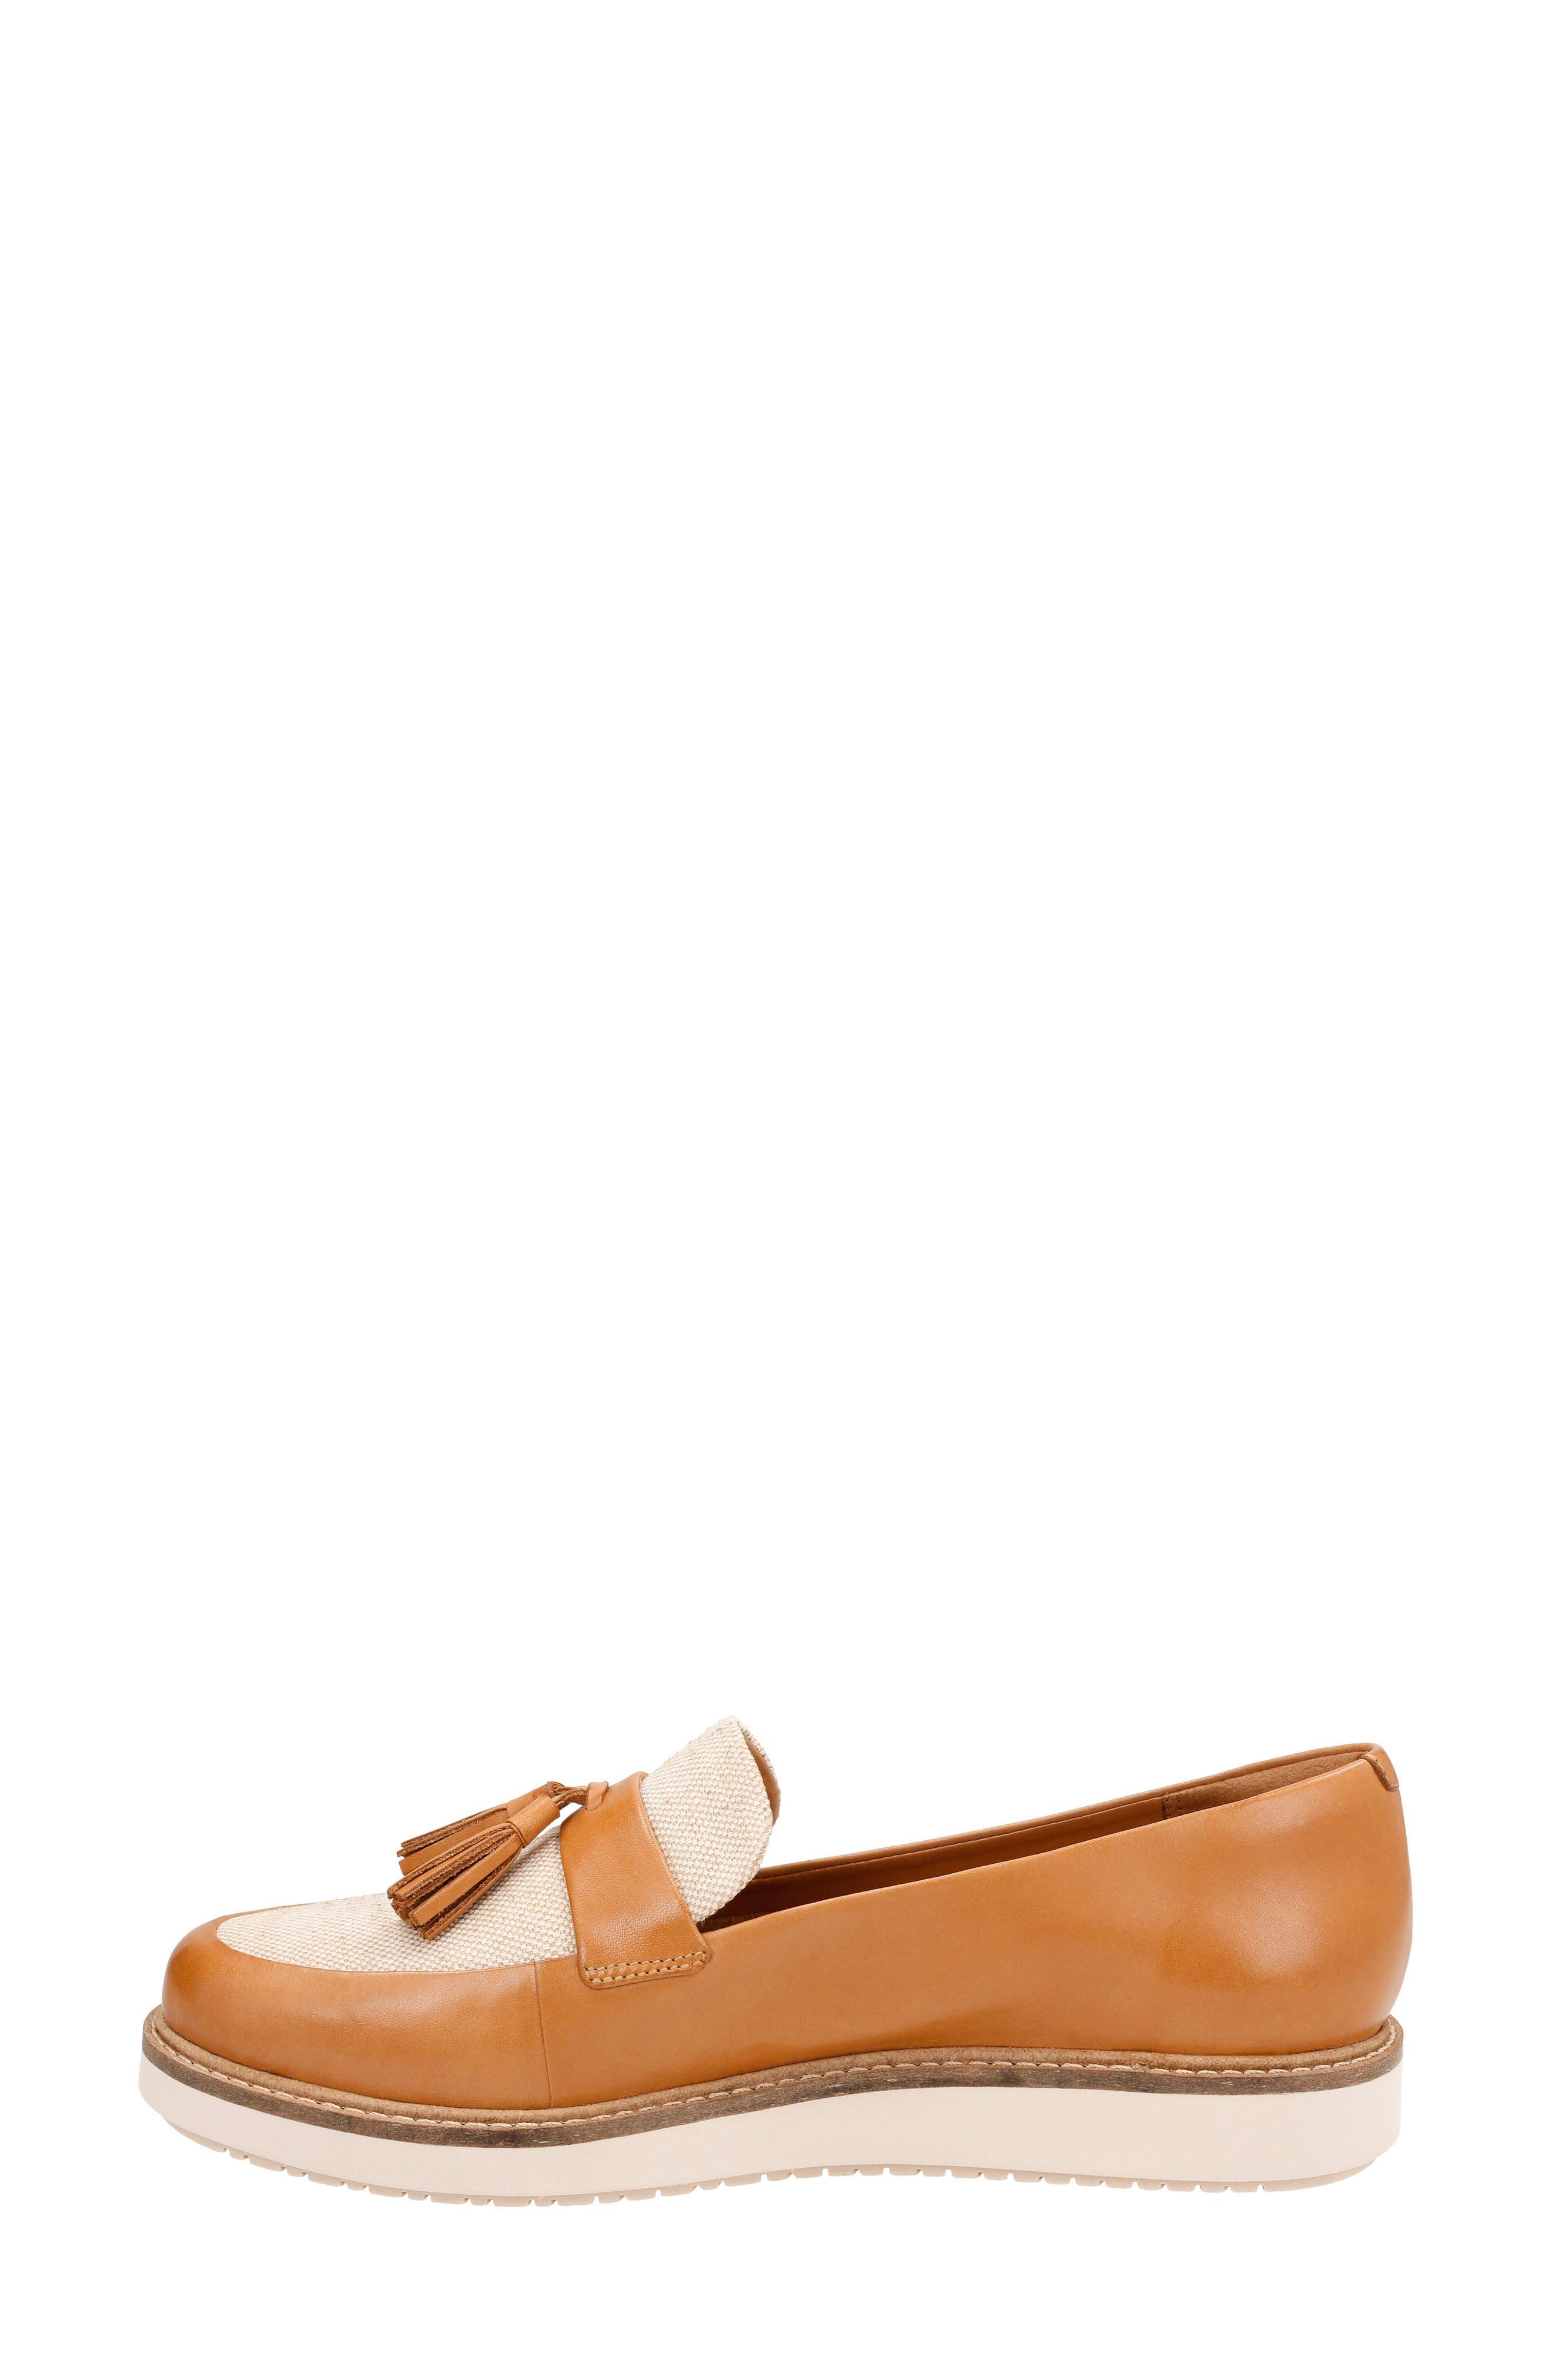 Glick Castine Tassel Loafer,                             Alternate thumbnail 3, color,                             Light Tan Leather